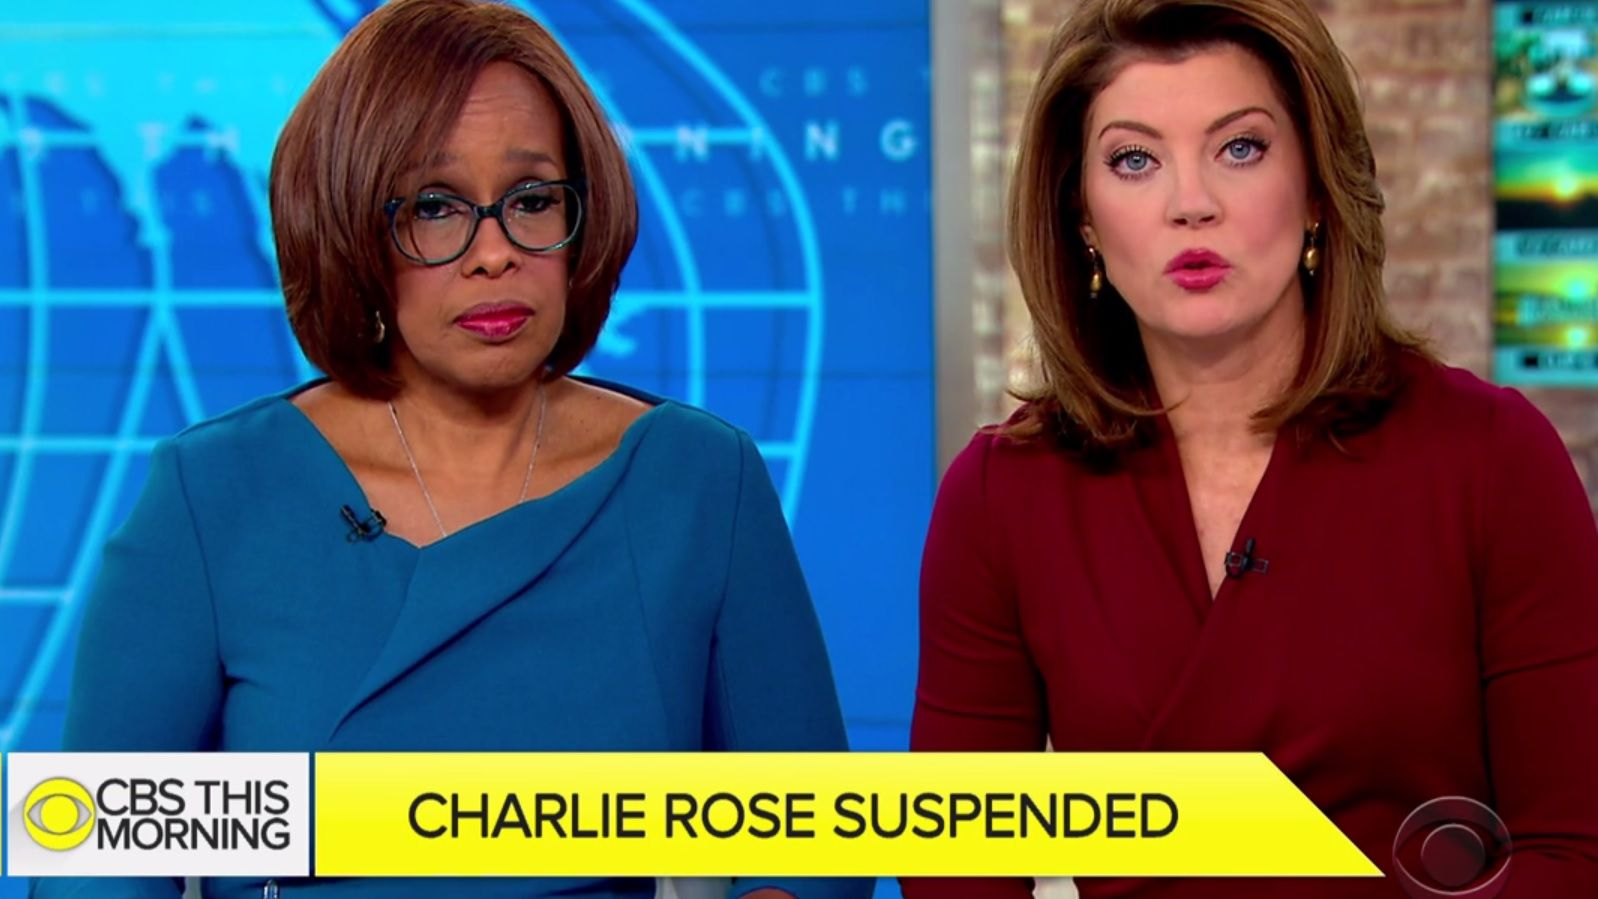 CBS This Morning addresses Charlie Rose suspension